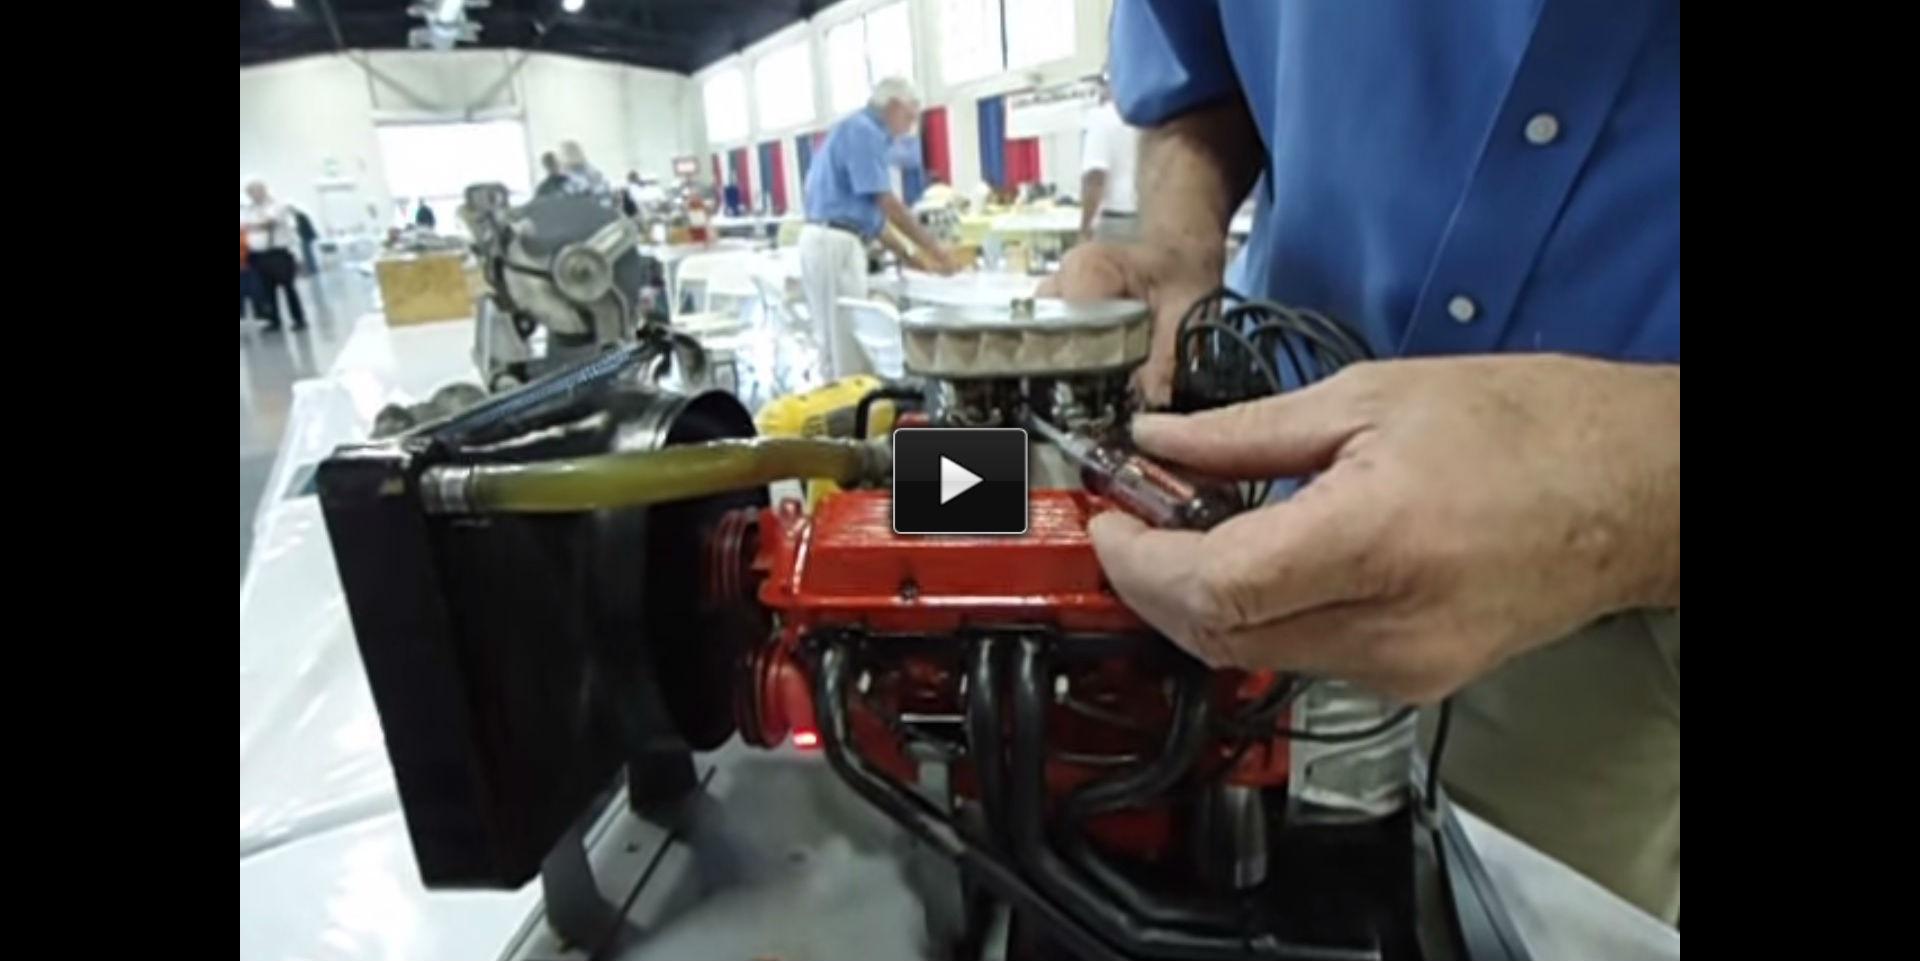 miniature chevy small block V8 model engine